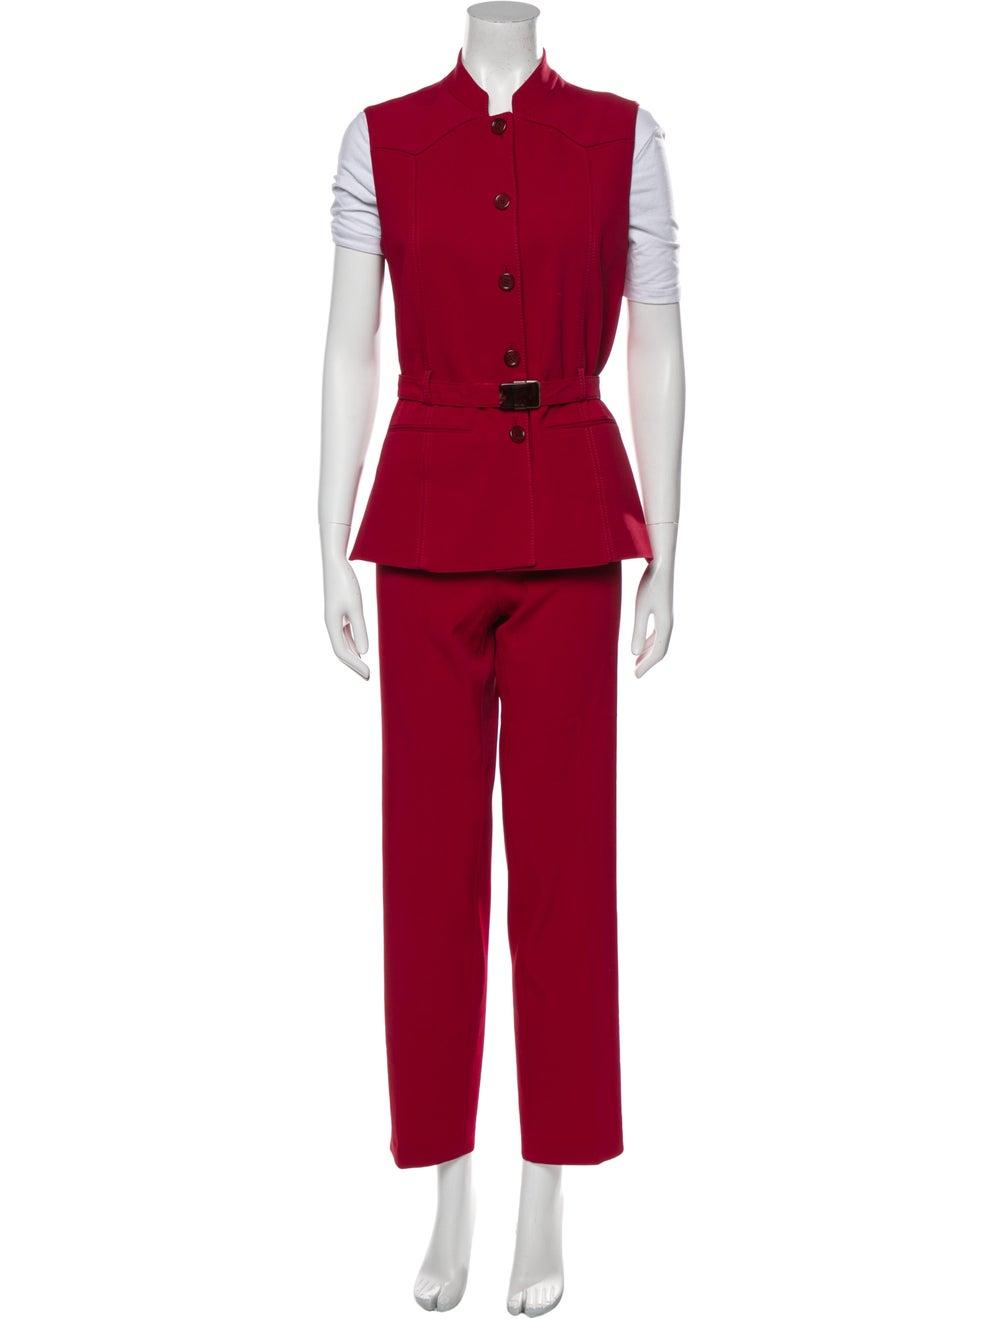 Prada Vintage 1990's Pant Set Red - image 1